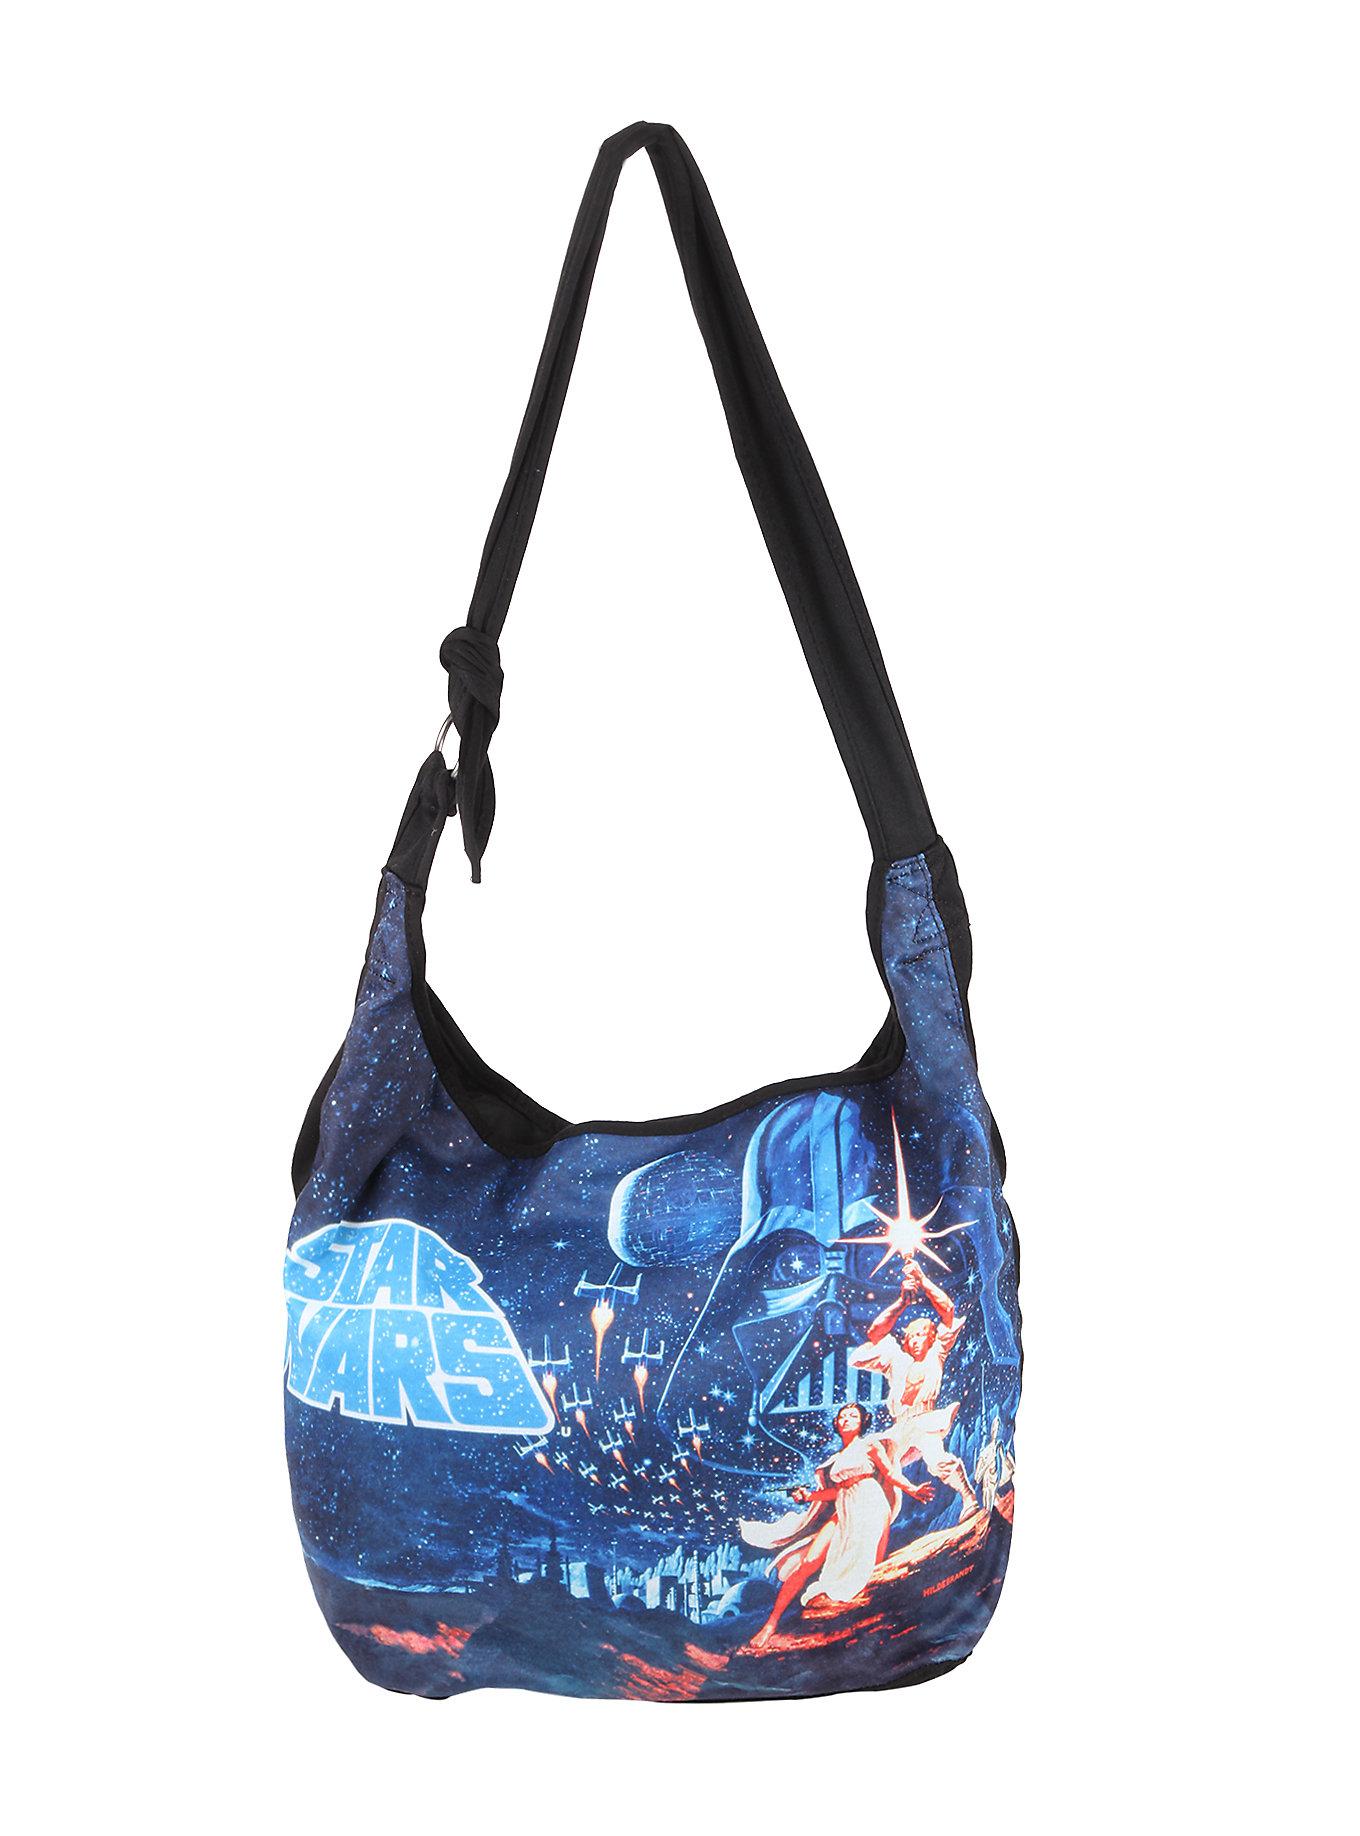 Hot Topic Star Wars Hobo Bag